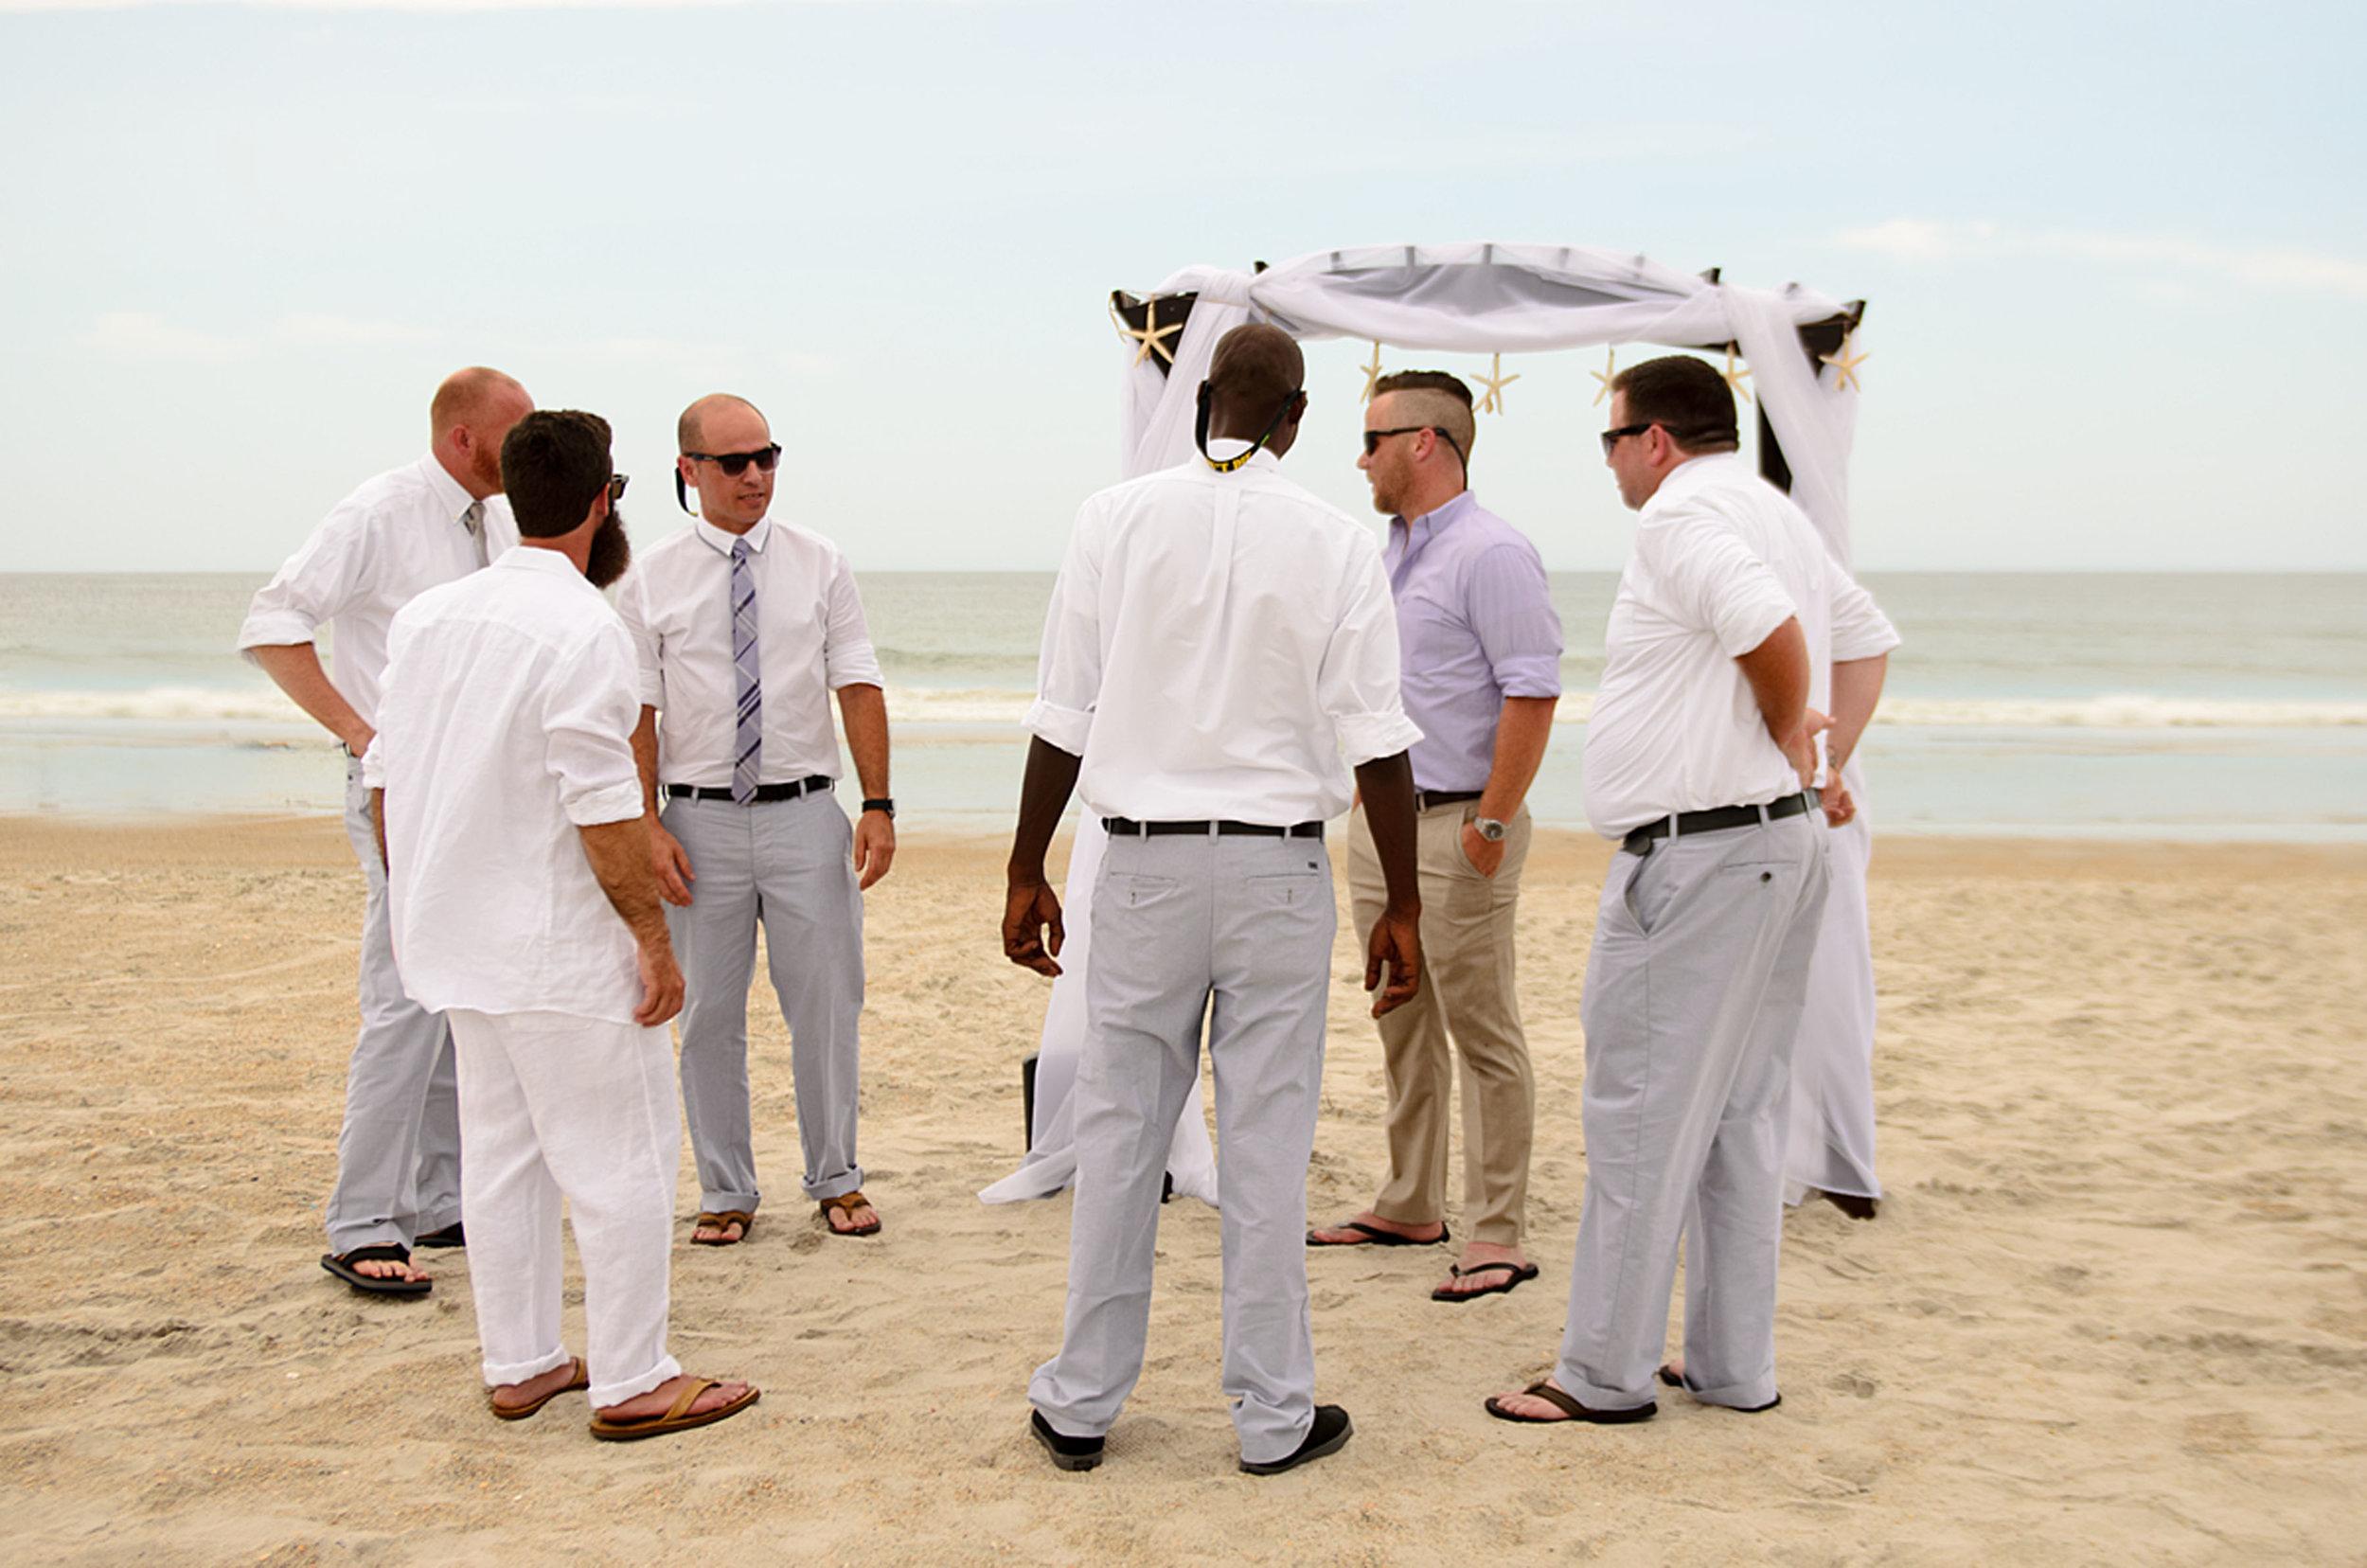 North_Carolina_Wedding_Photographer_Tiffany_Abruzzo_Ceremony_05.jpg